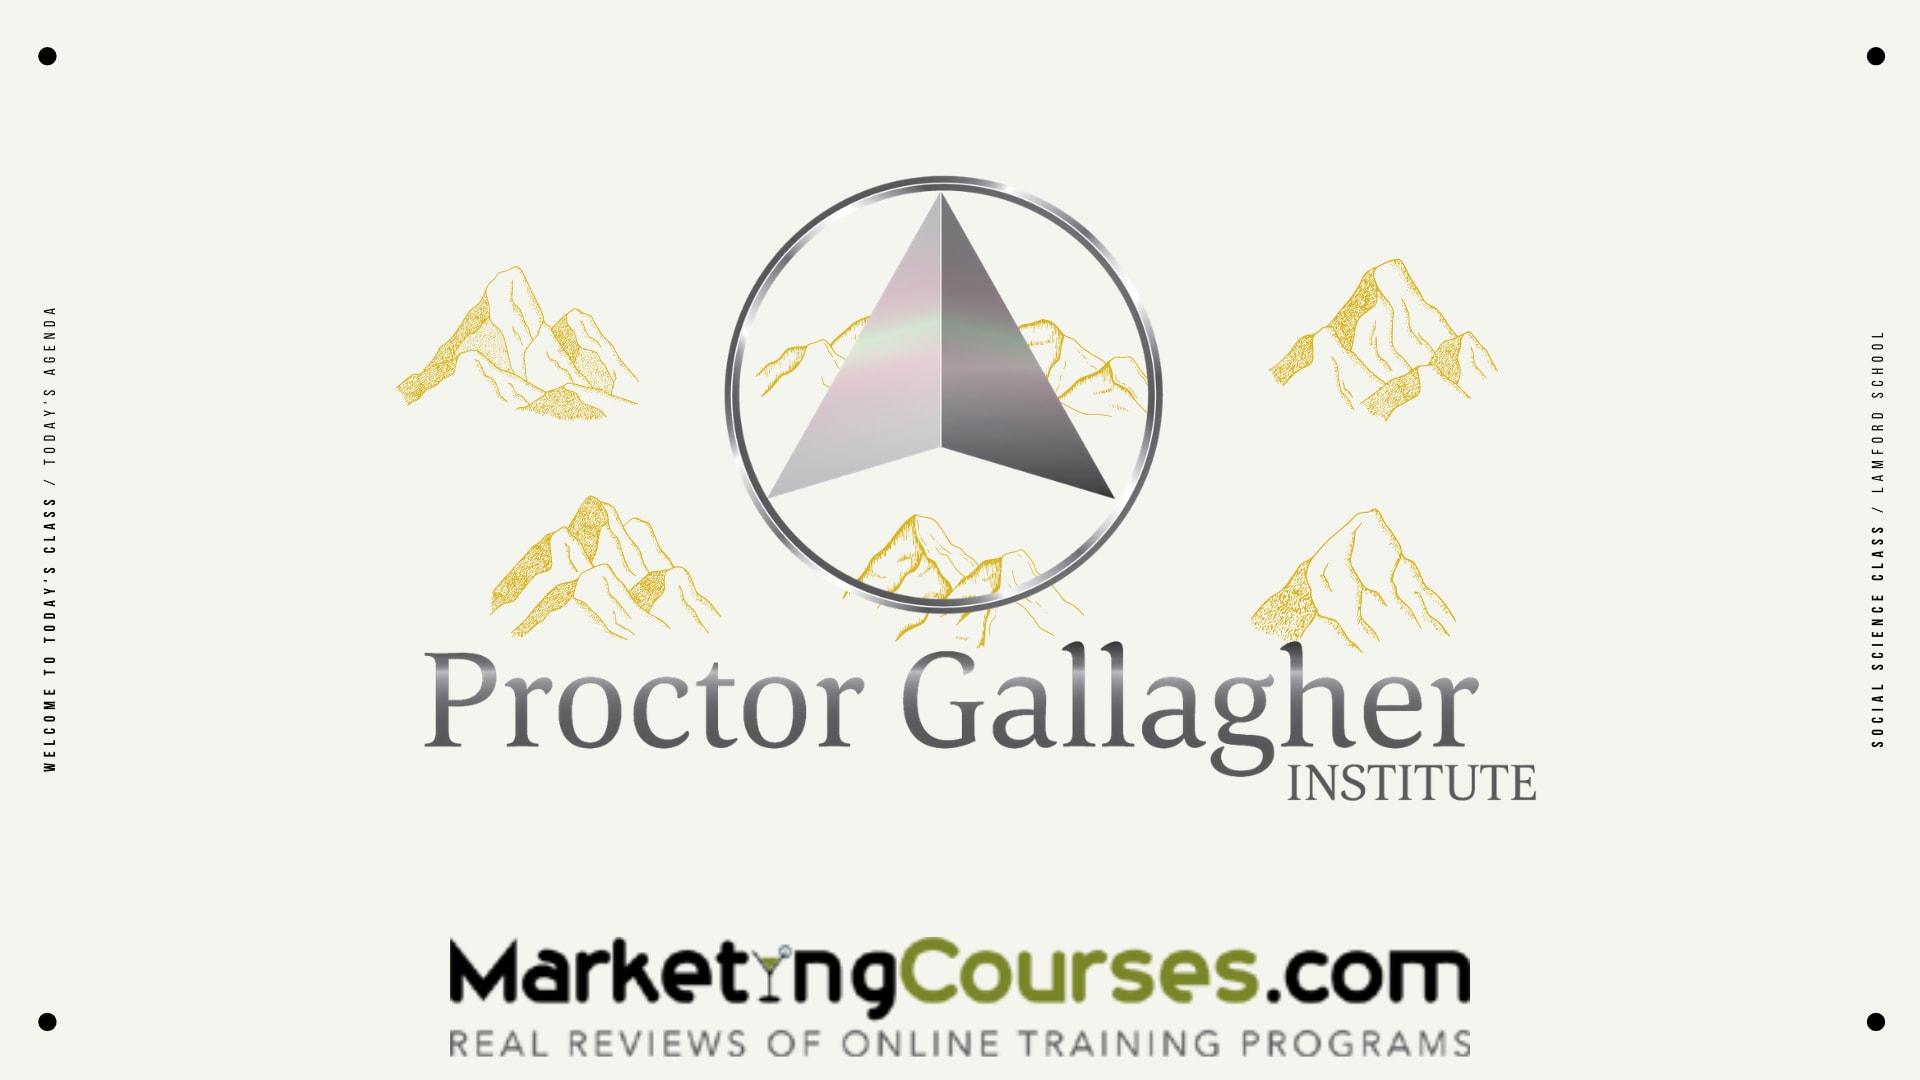 Proctor Gallagher Institute